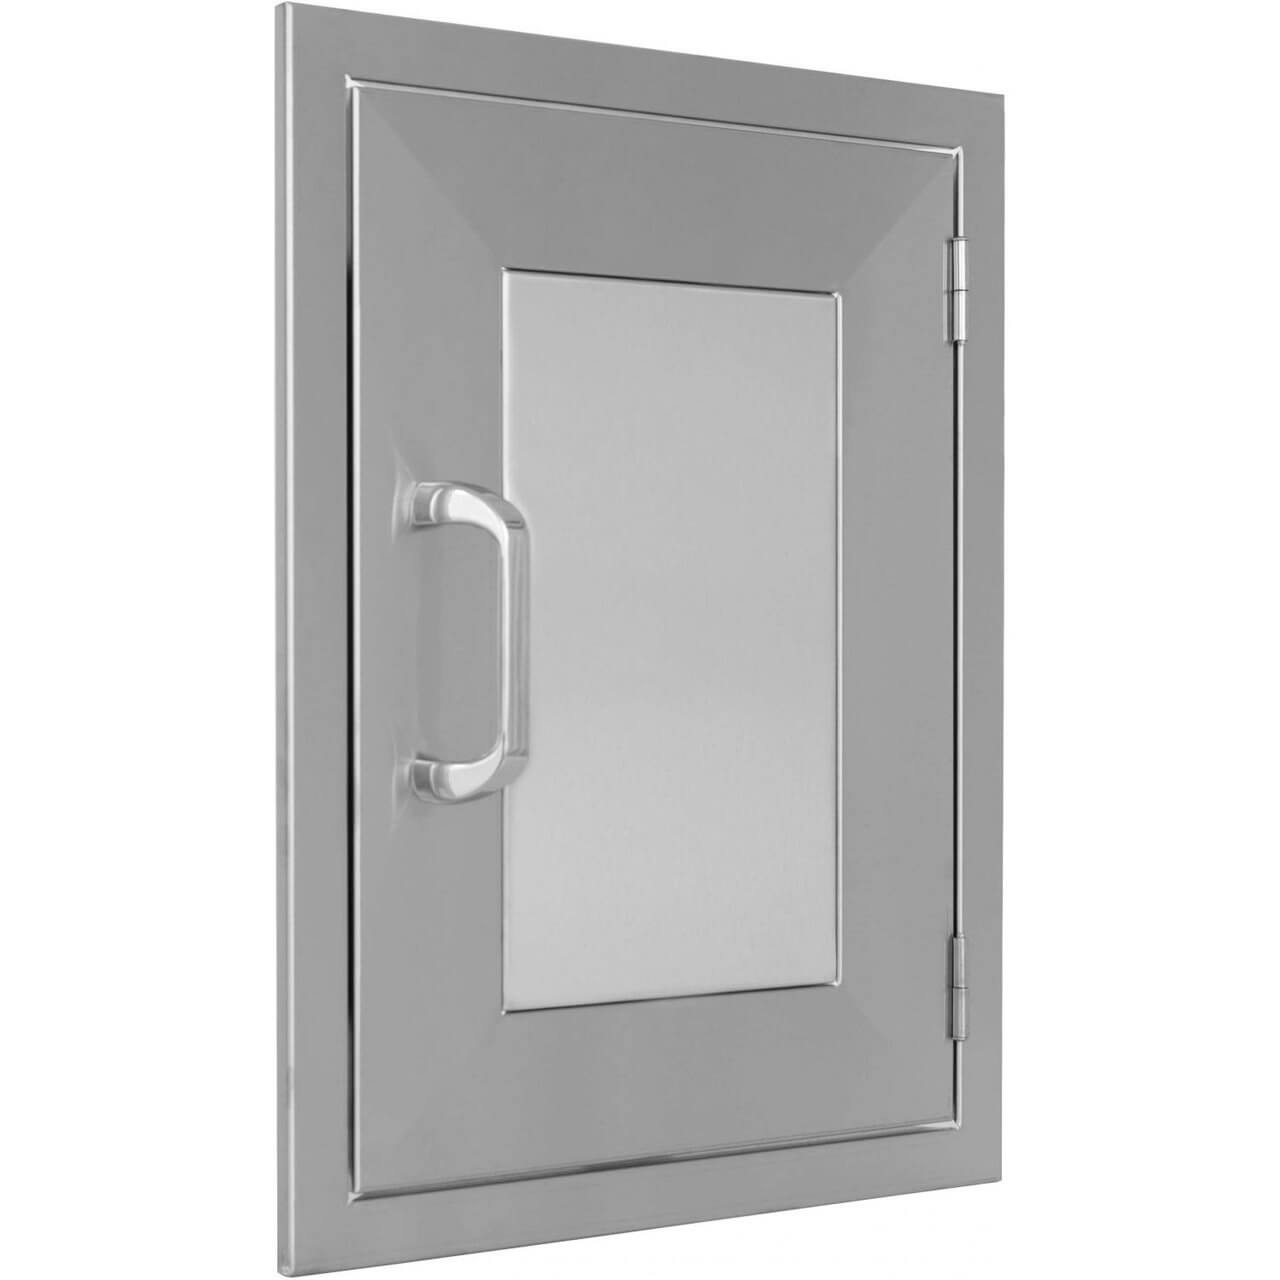 Acces Vertical Of Denali Series 14 20 Single Access Vertical Door Bbq